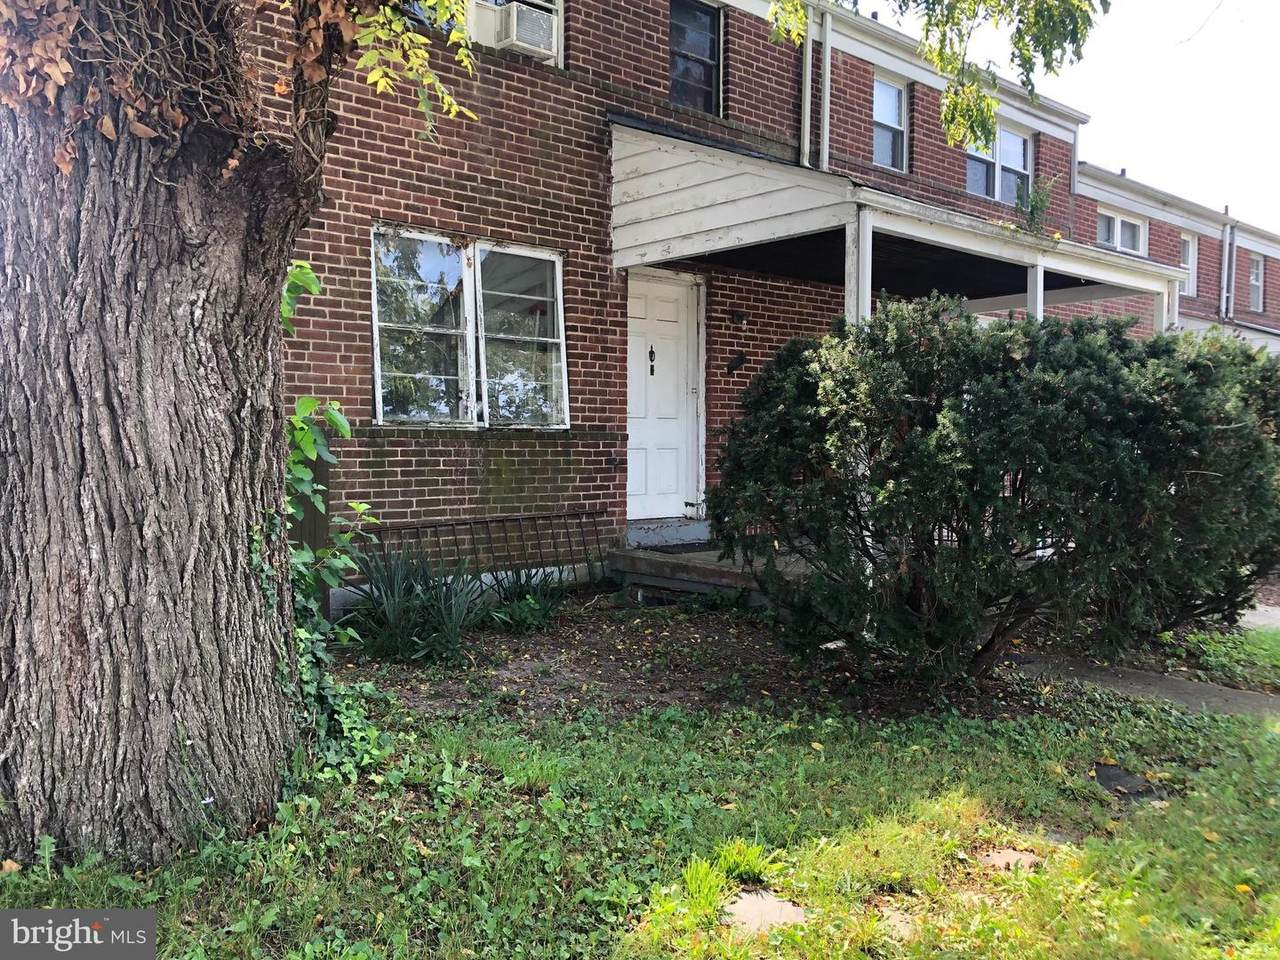 263 Linden Avenue - Photo 1